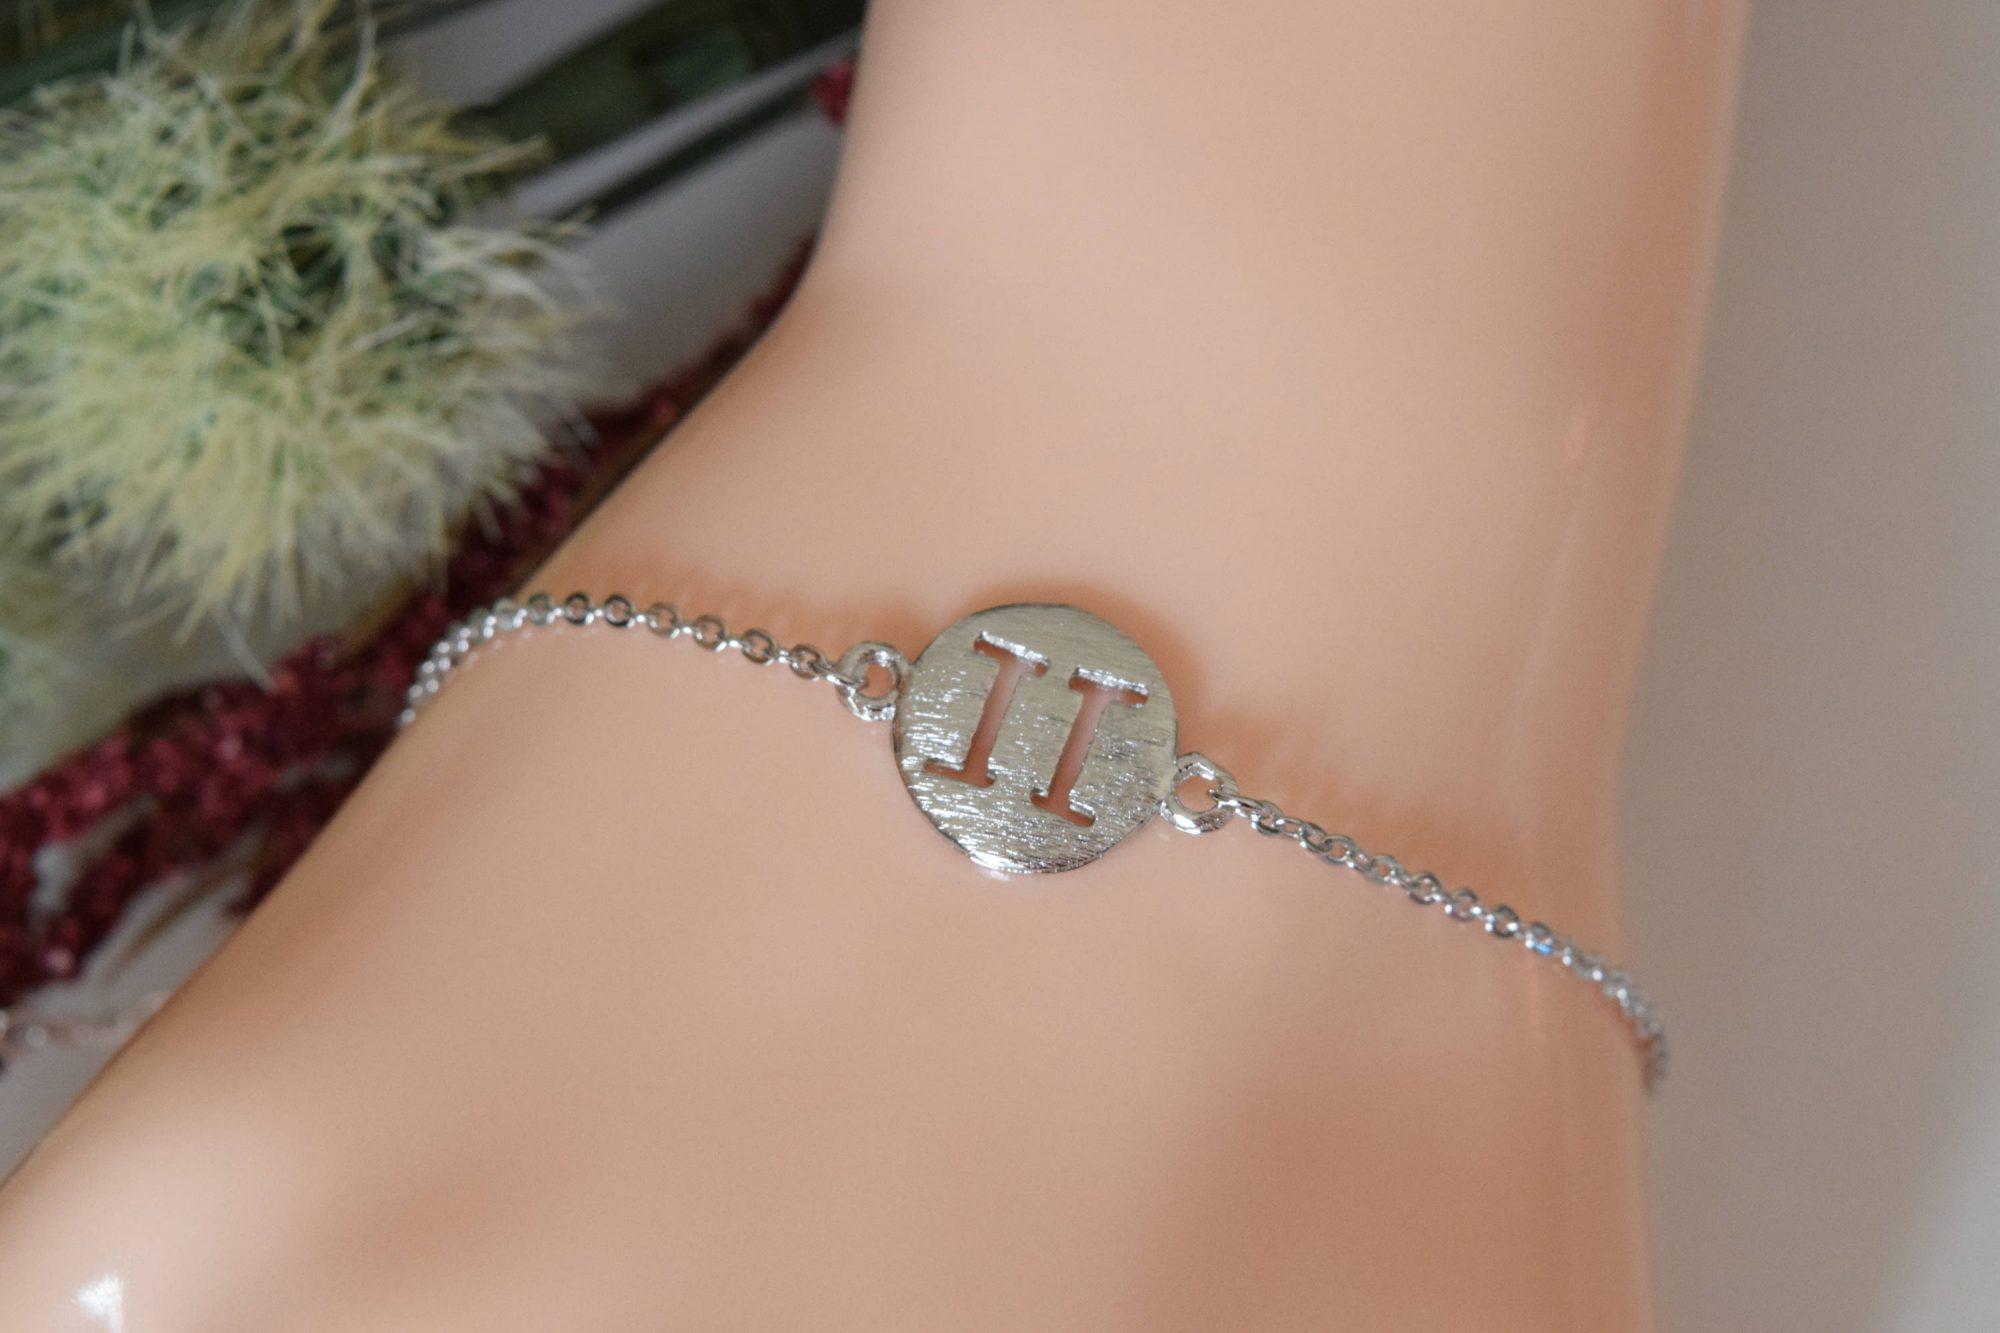 AlluringGrace zodiac jewelry